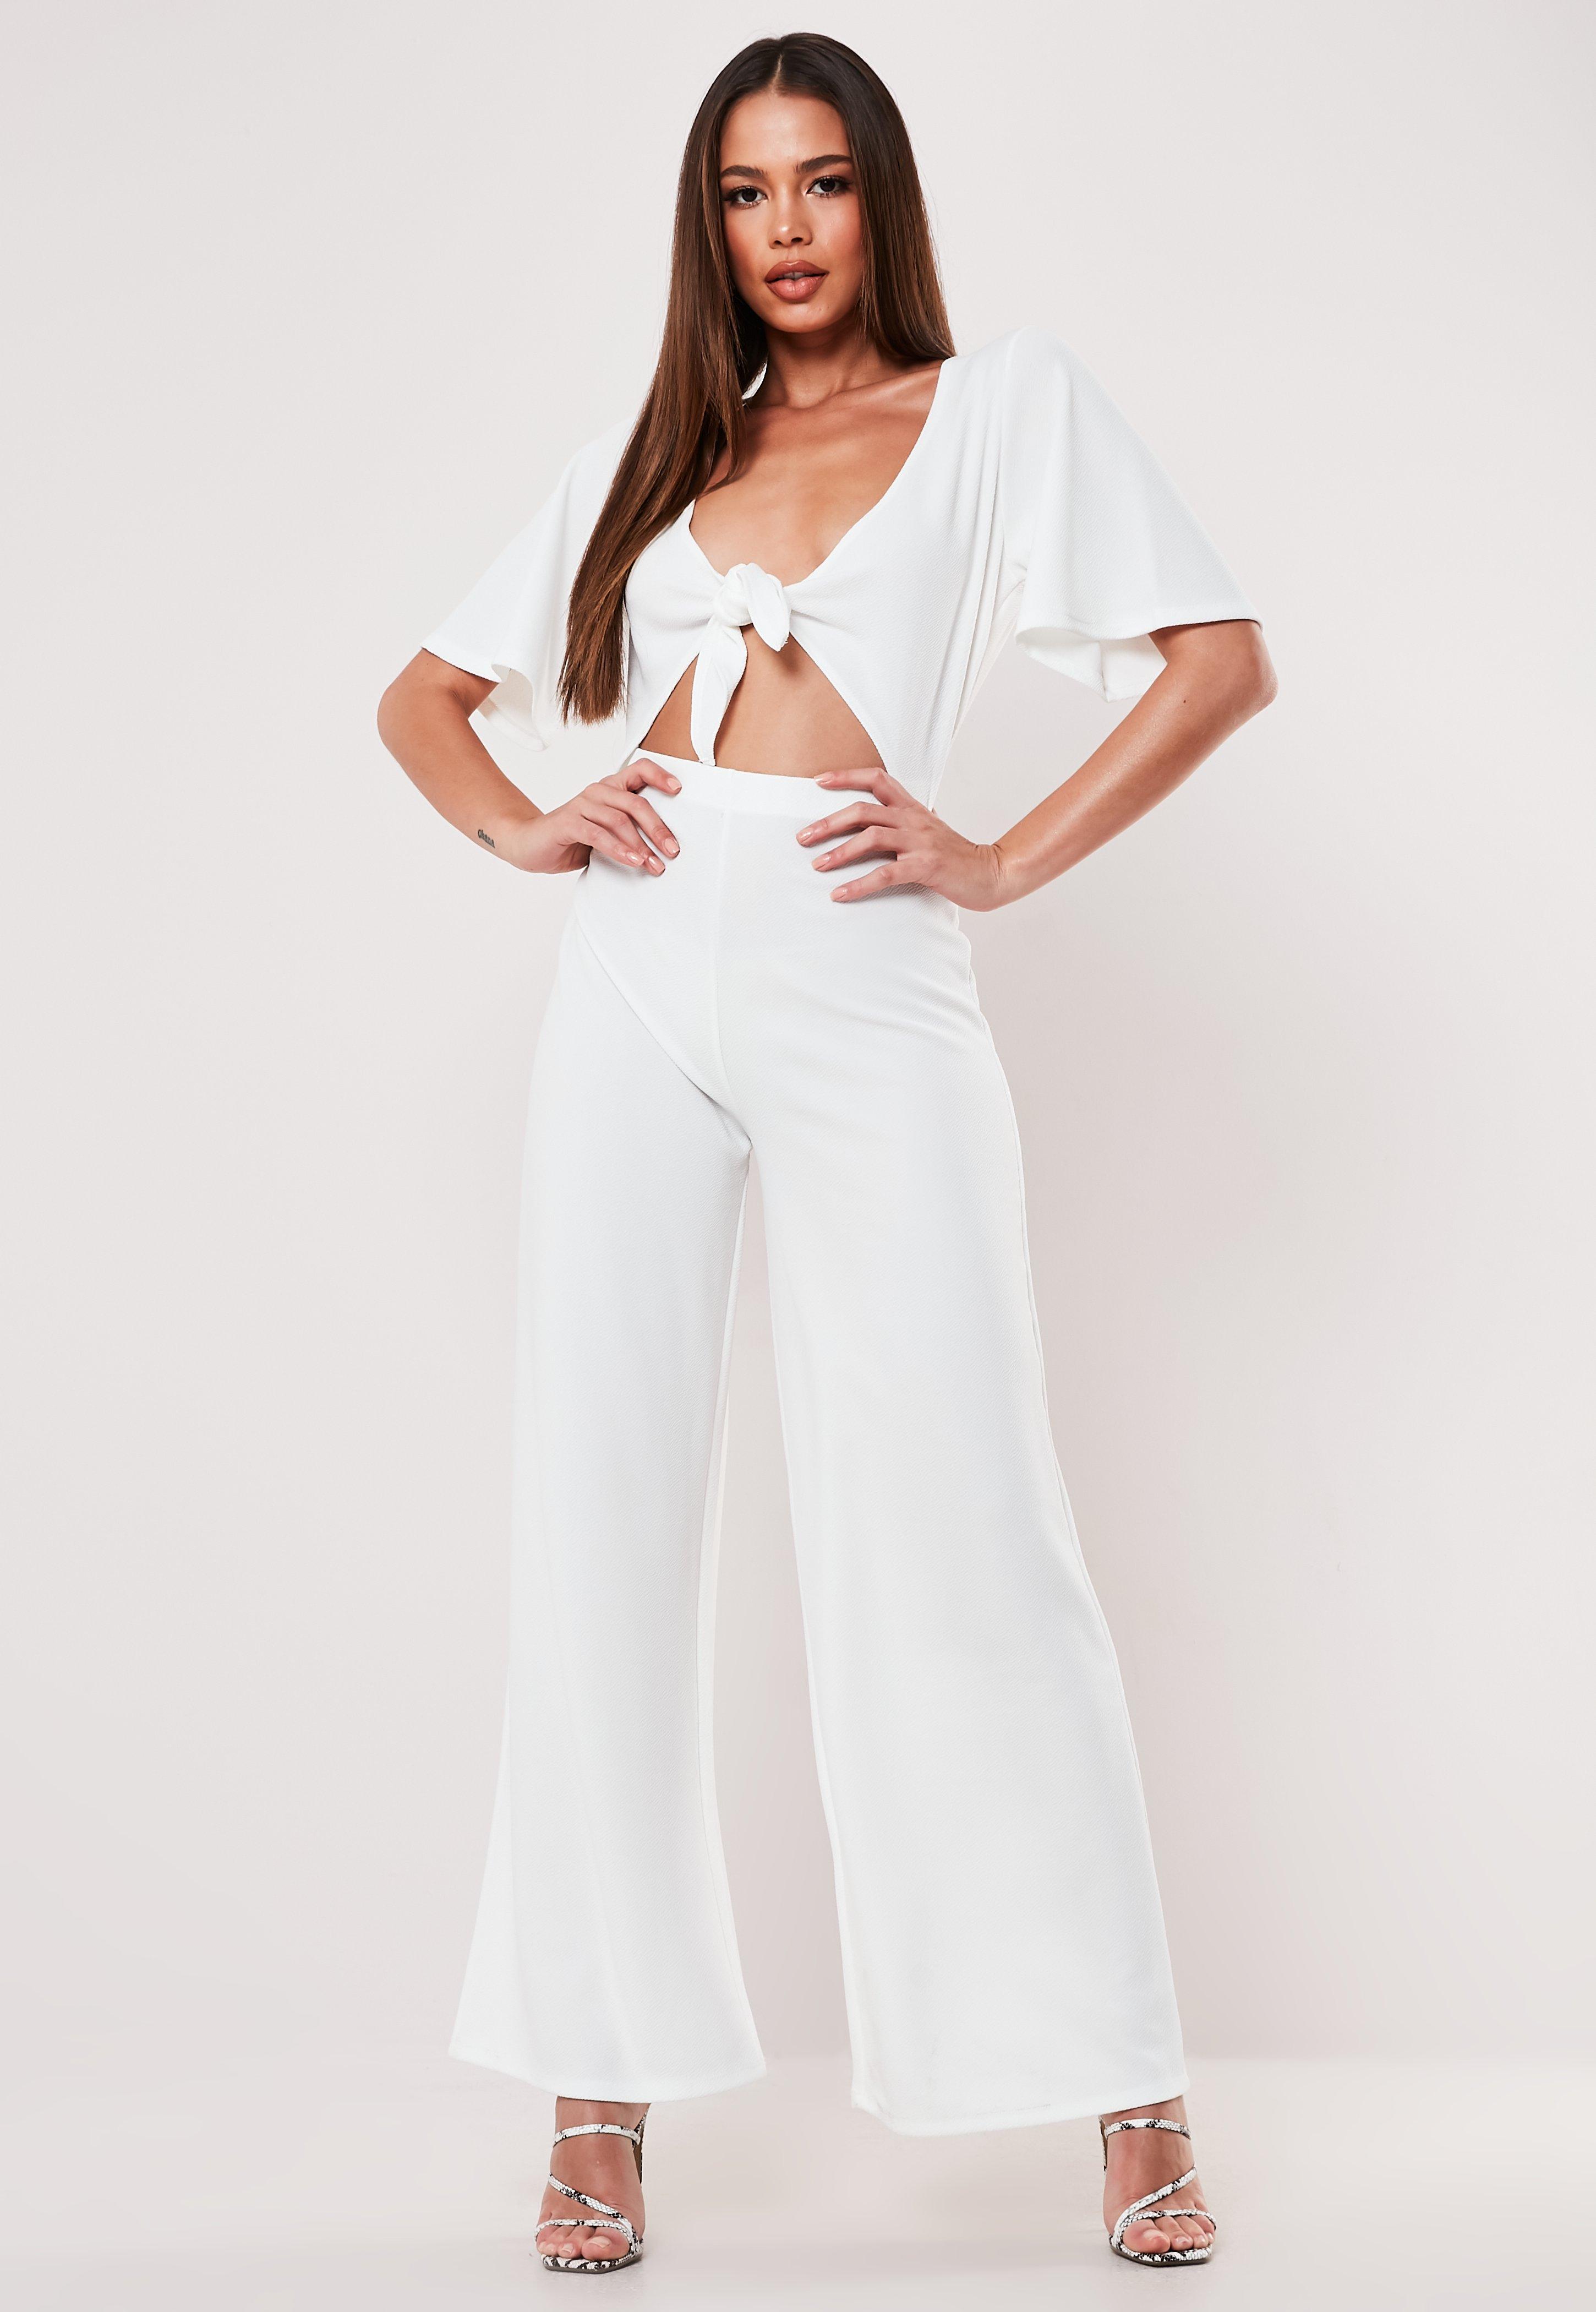 1e0f0f35eba042 Petite Clothing | Womens Petite Clothes Online - Missguided